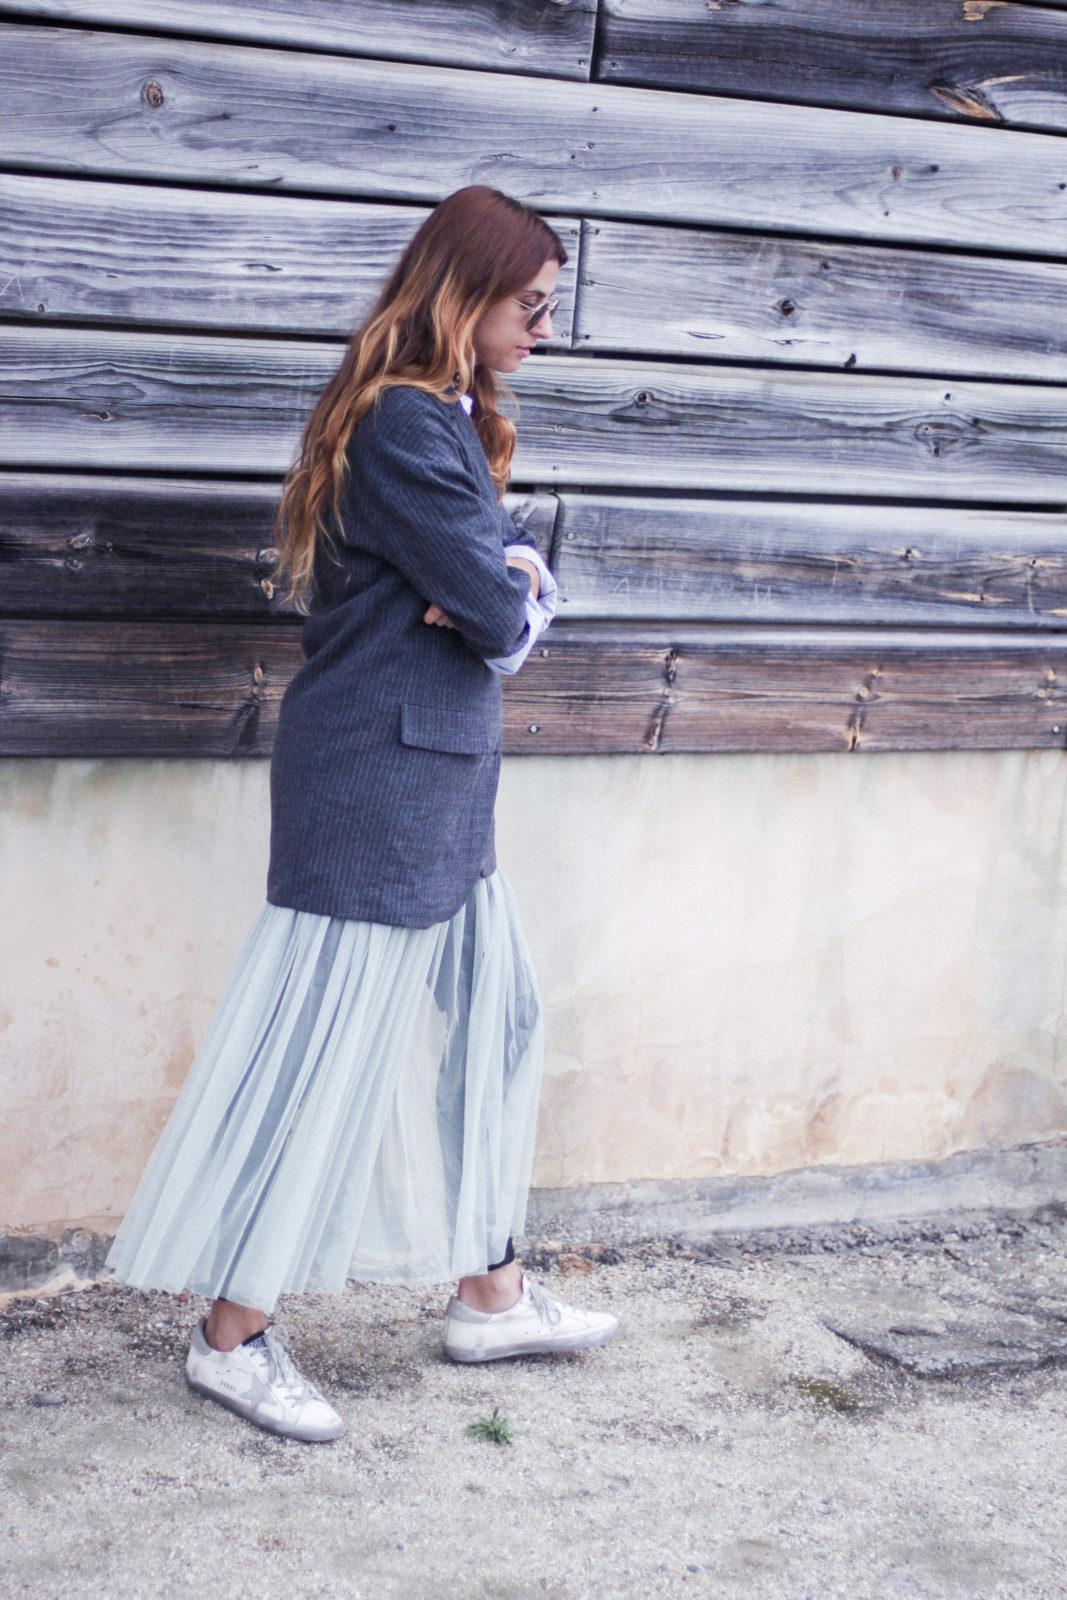 vestido_de_tul_sobre_pantalon_estilo_bailarina_blazer_oversize_pendientes_de_aros_choker_tendencias_trends_fall_2016_street_style_donkeycool-38